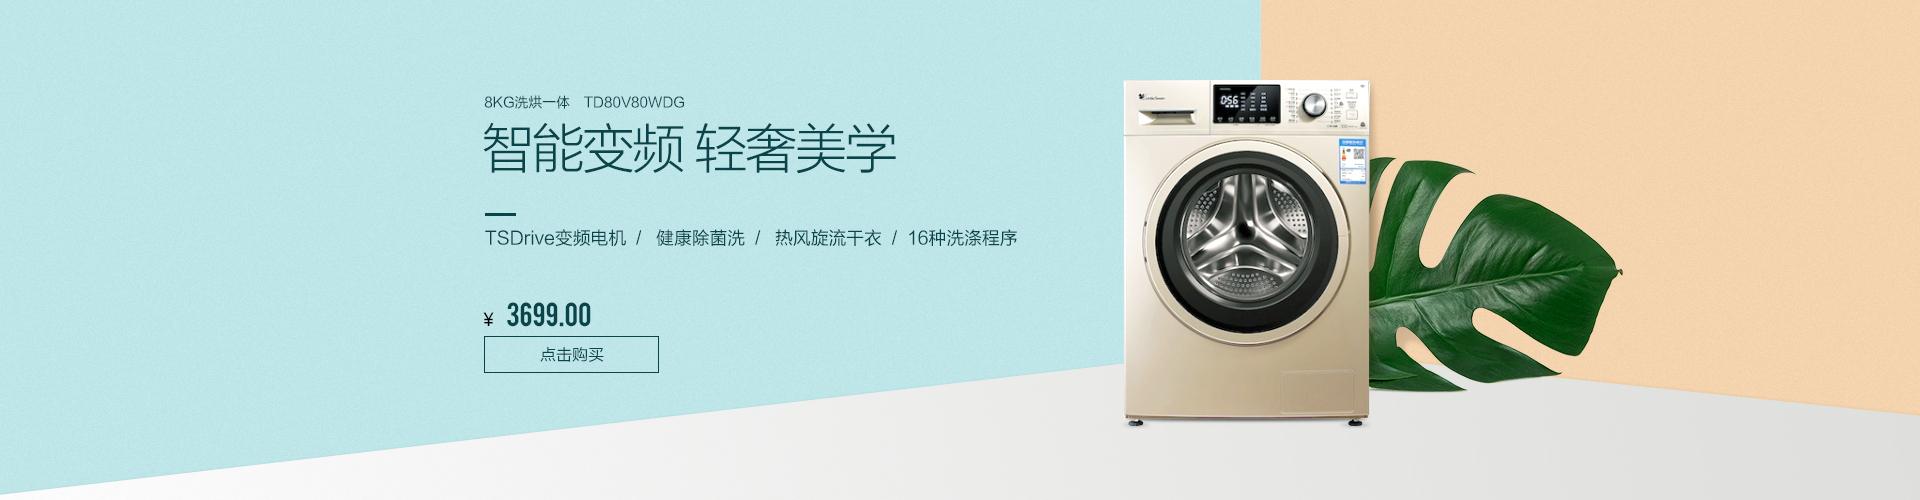 8公斤洗烘一体机 TD80V80WDG